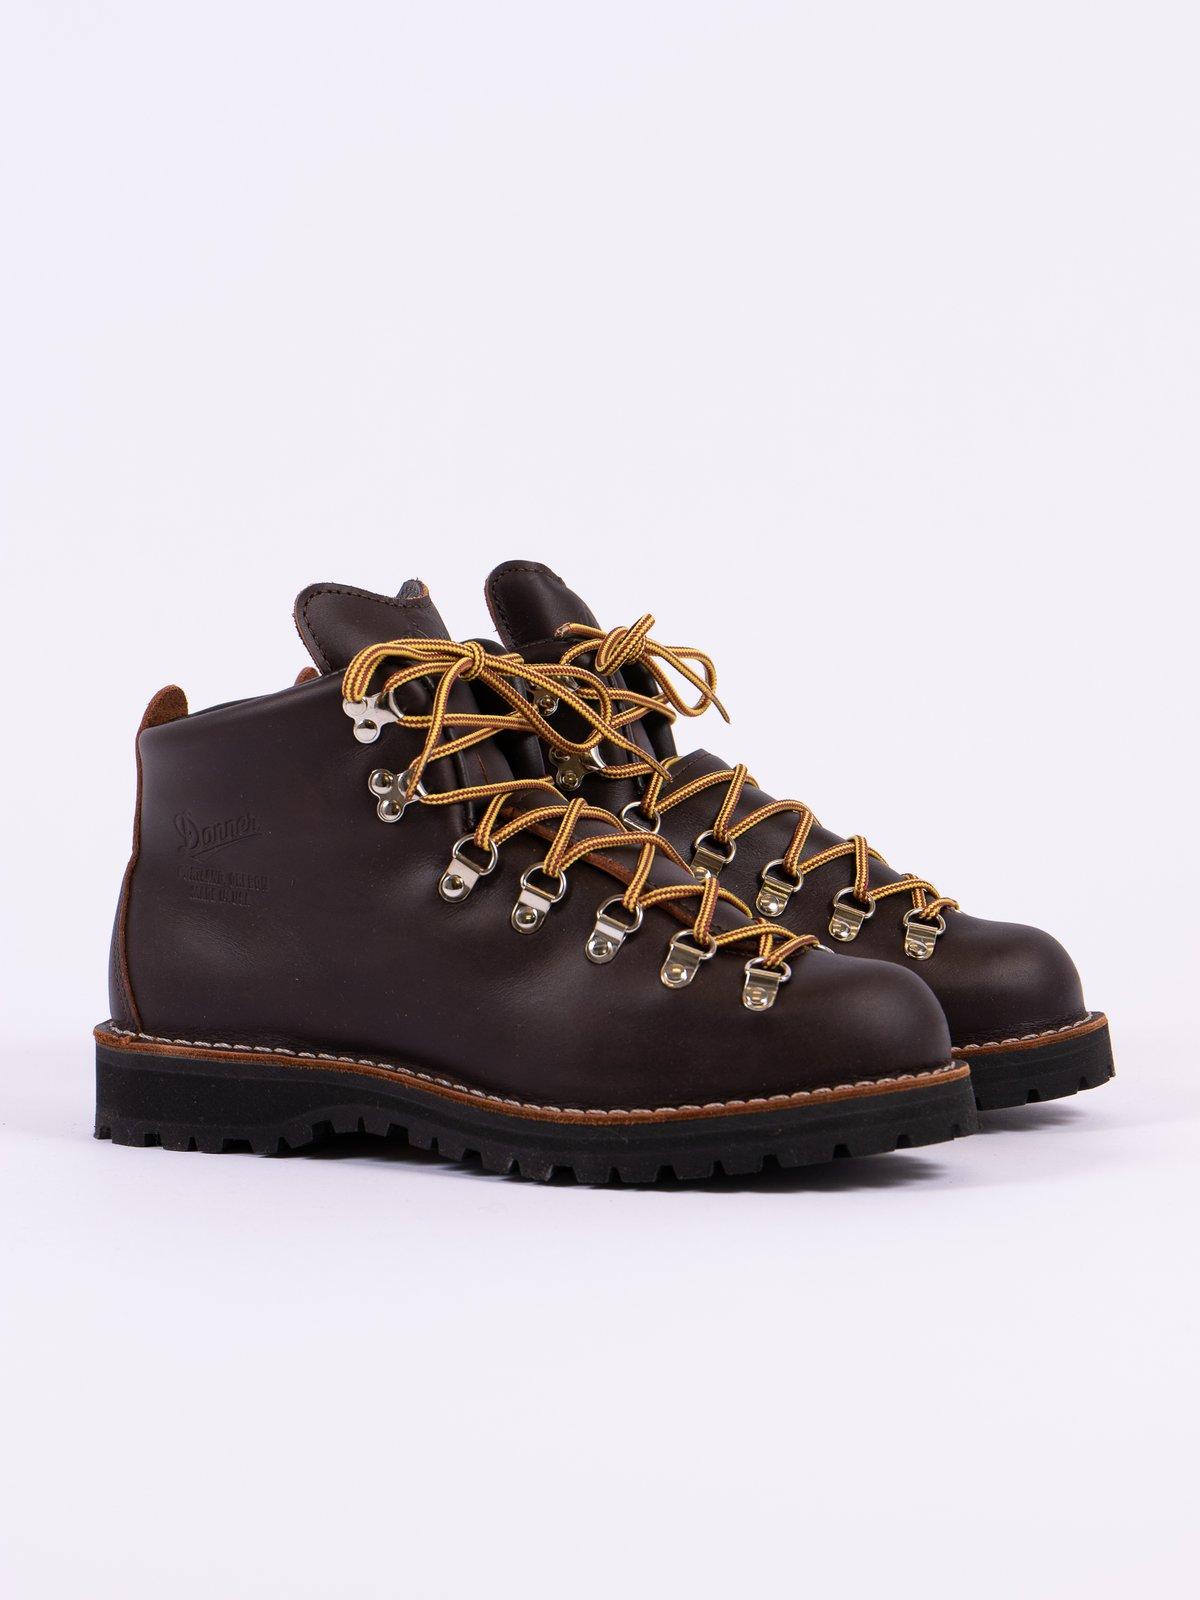 Dark Brown Mountain Light Boot - Image 1